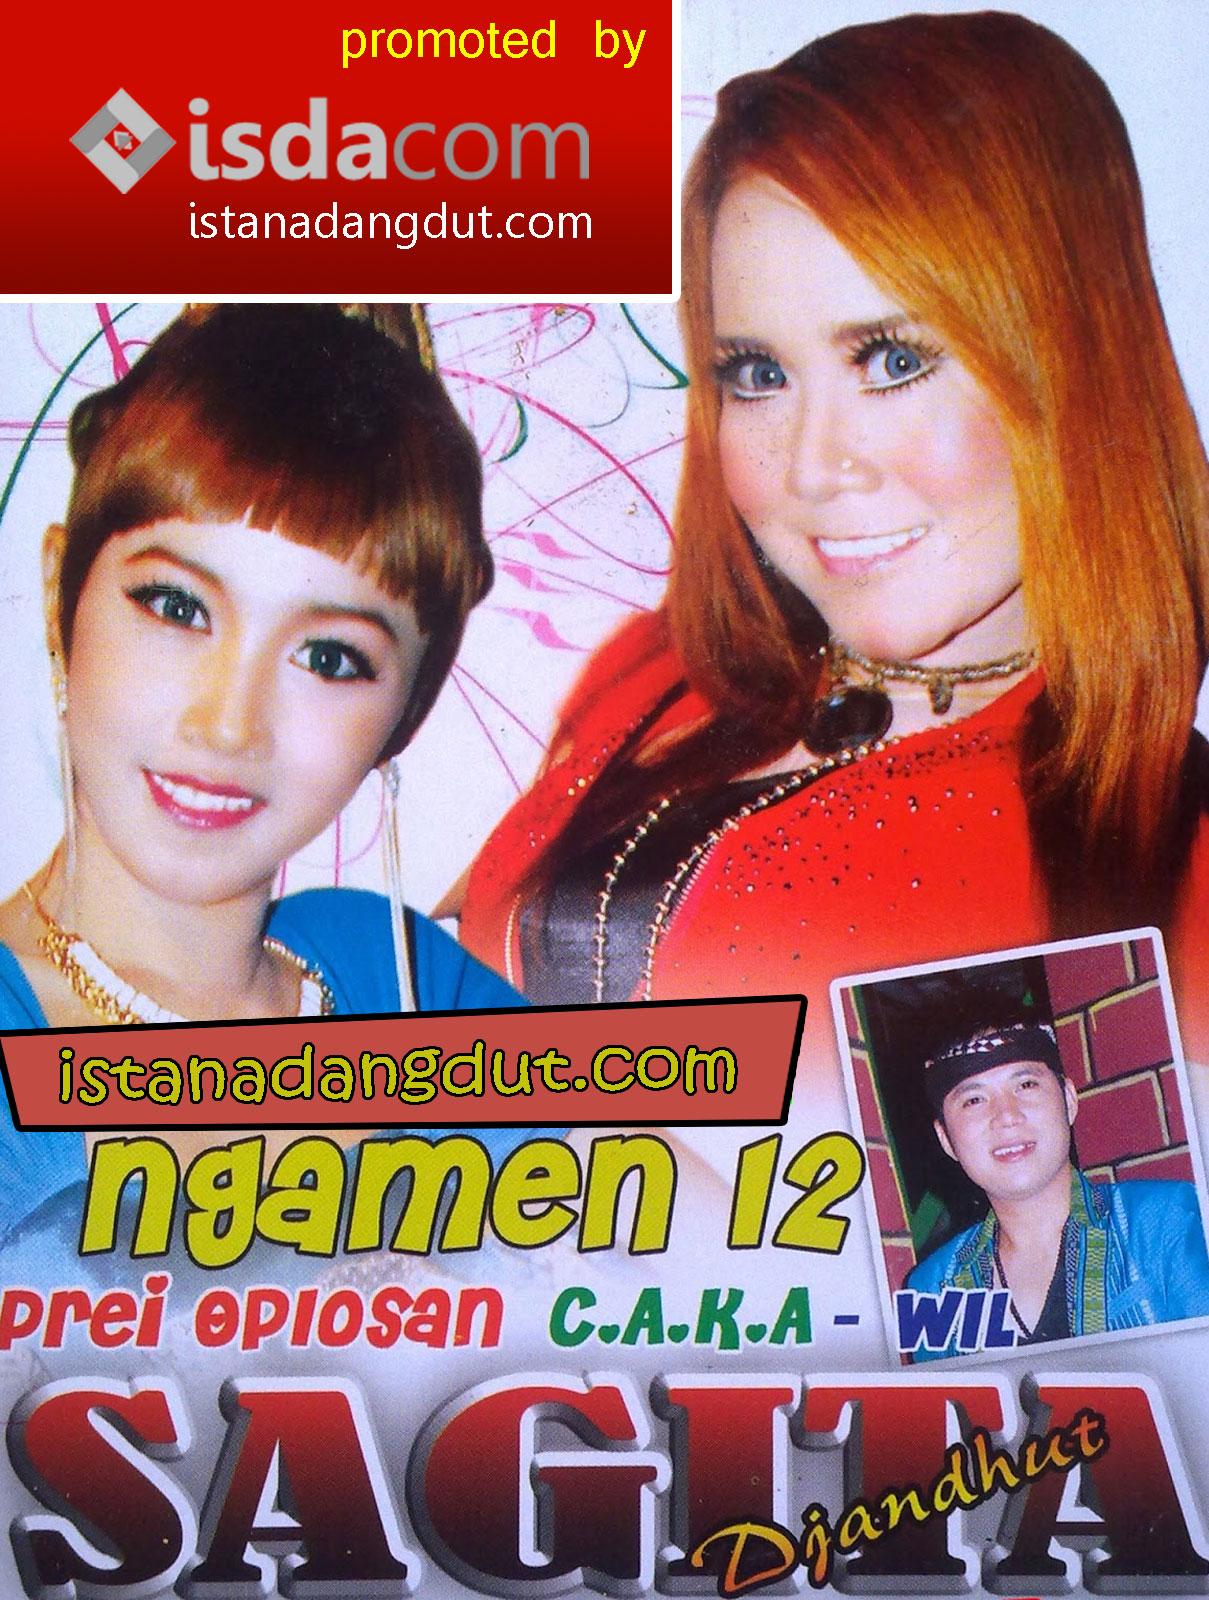 Download Lagu Dangdut Wanita Idaman Lain Sera : download, dangdut, wanita, idaman, Download, Wanita, Idaman, Belajar